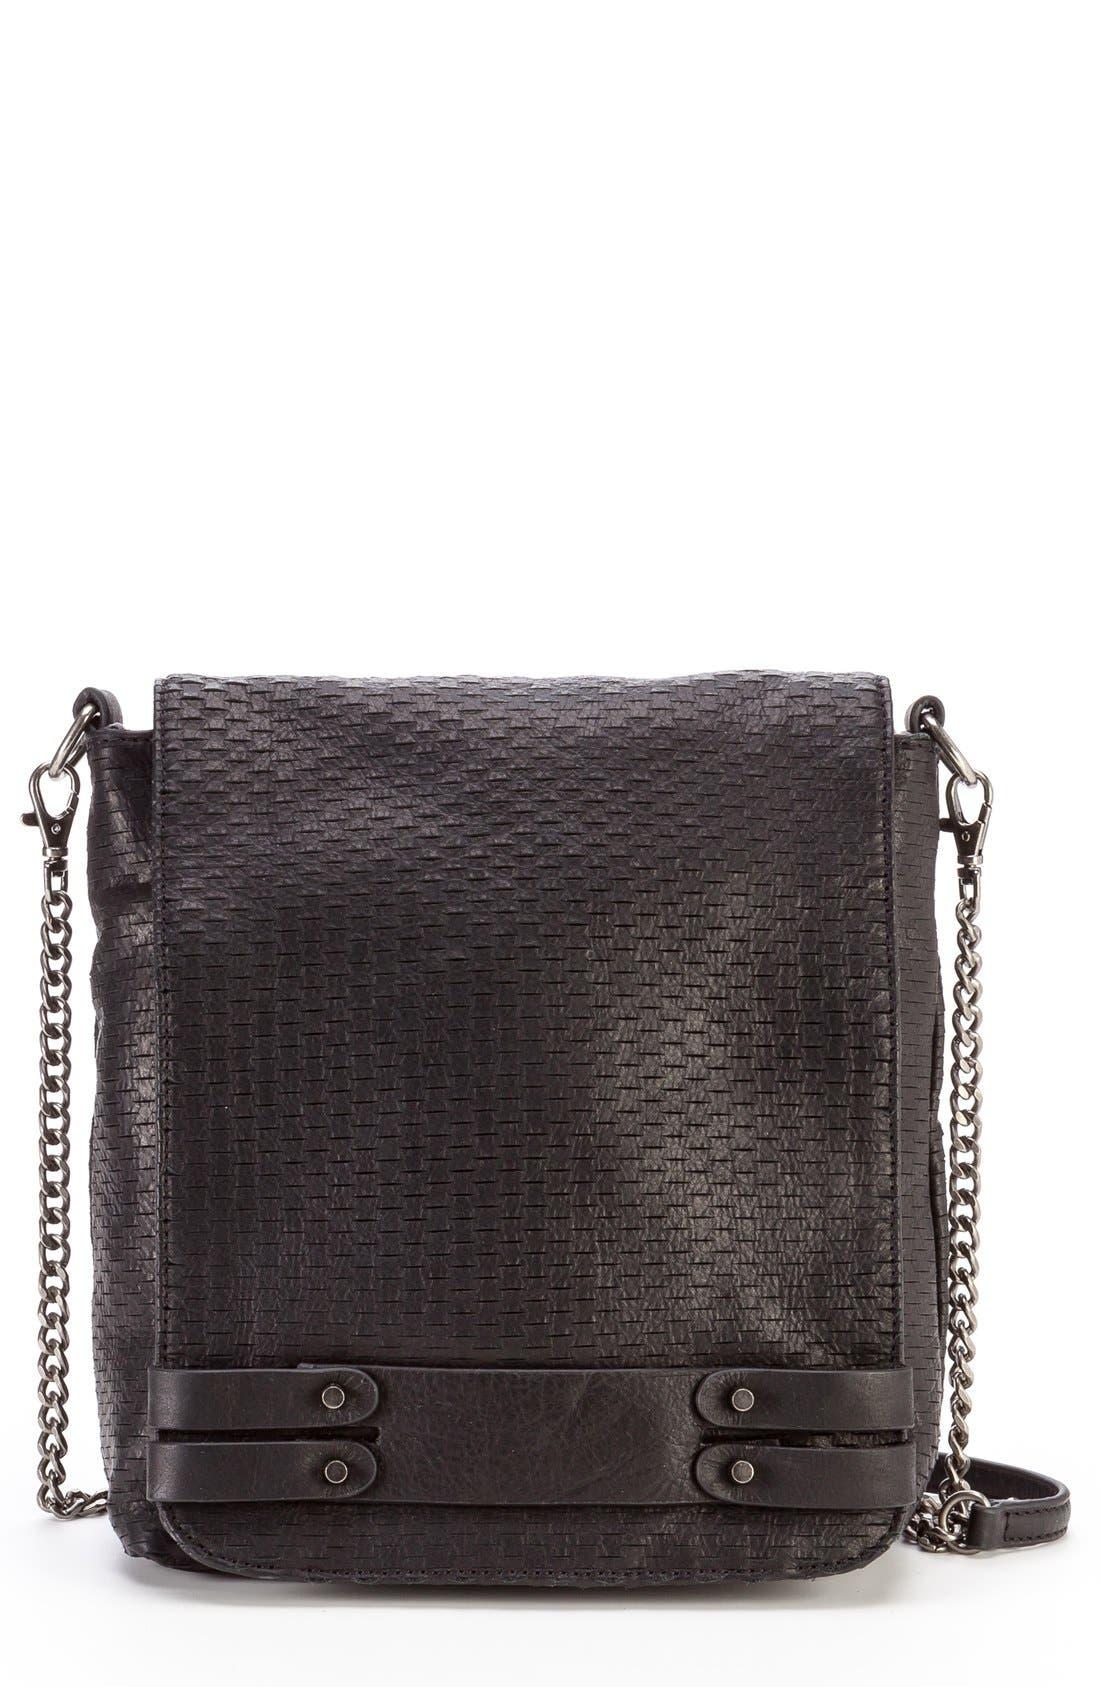 Alternate Image 1 Selected - She + Lo 'Bright Side' Leather Messenger Bag